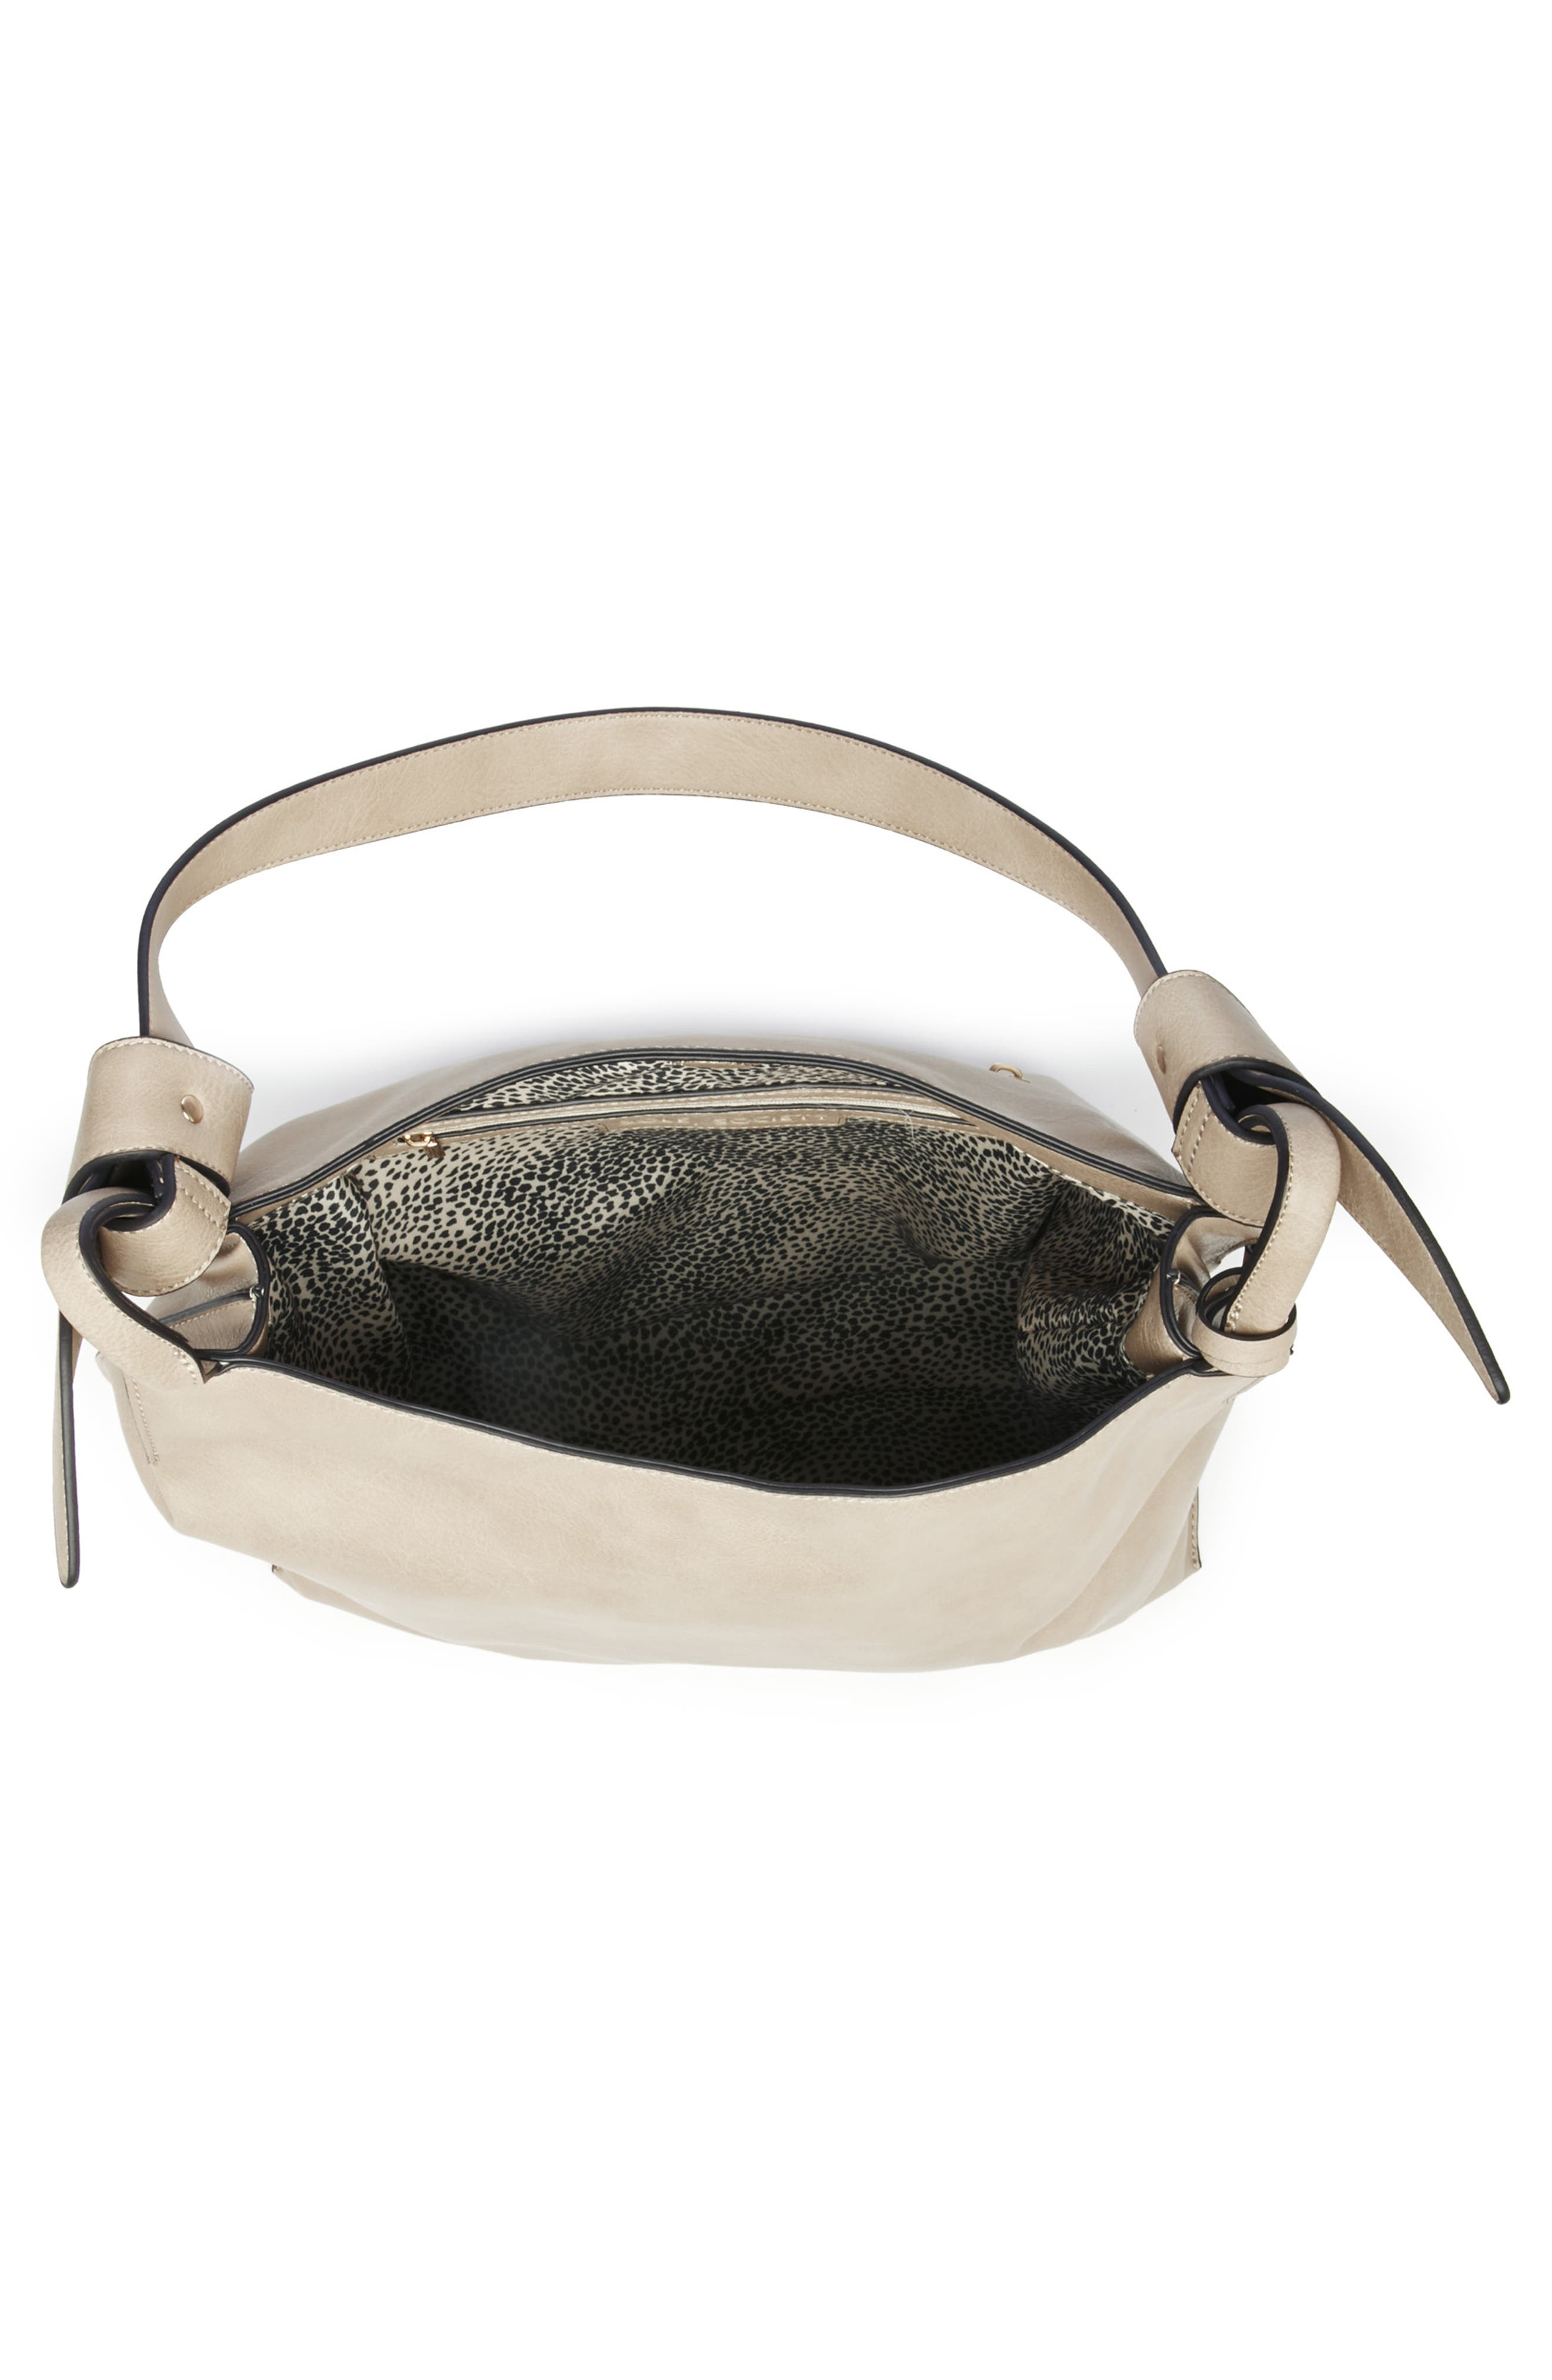 Josah Faux Leather Shoulder Bag,                             Alternate thumbnail 10, color,                             SAFARI